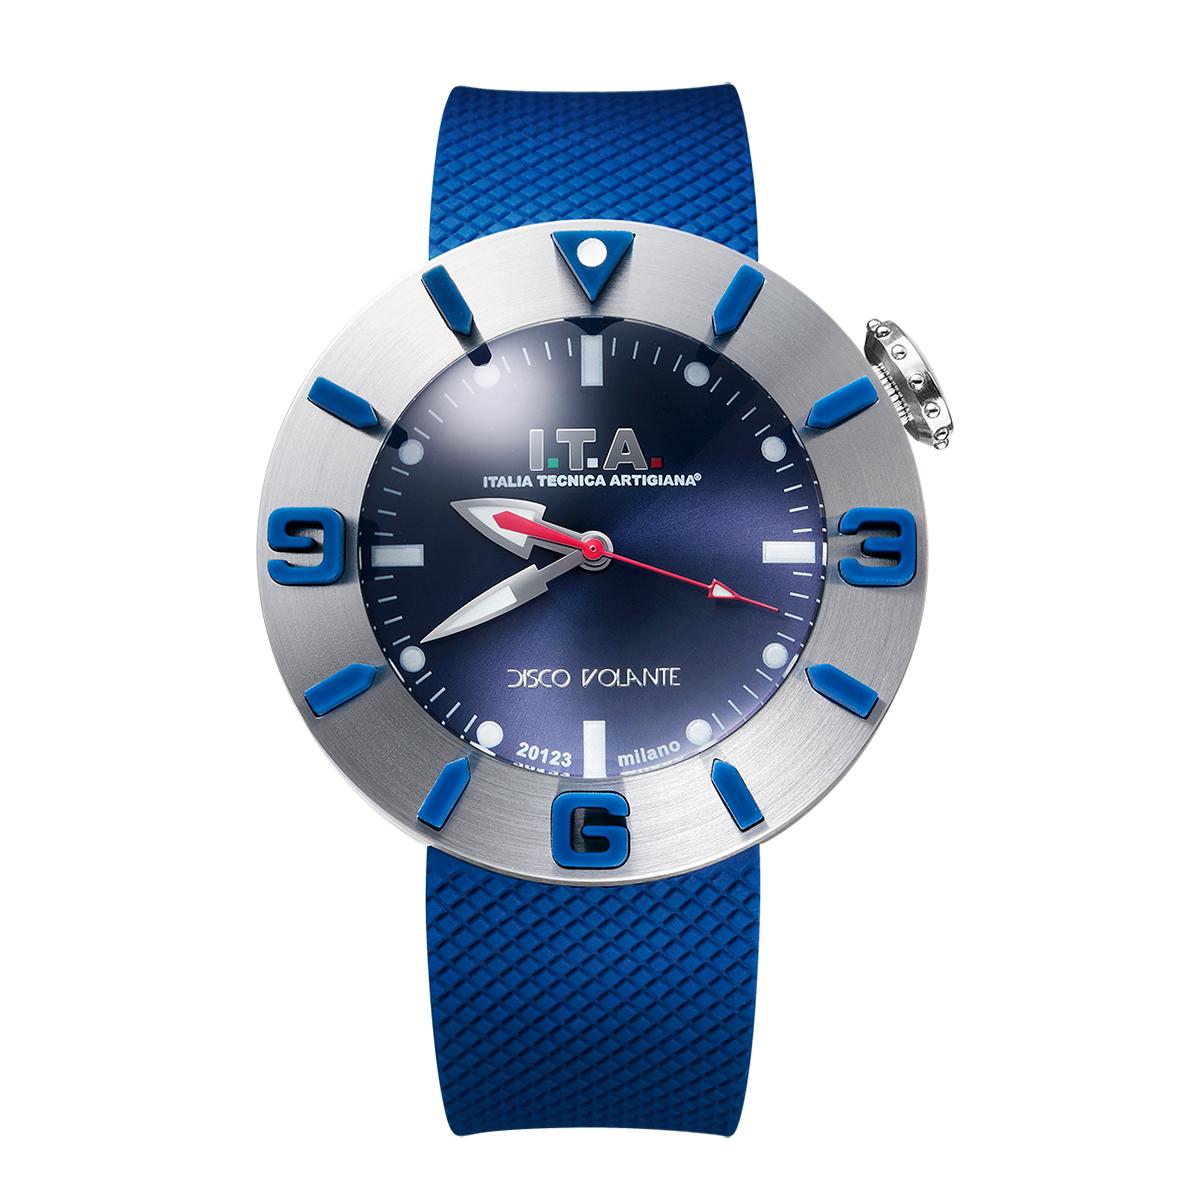 【I.T.A. アイティエー】DISCO VOLANTE ディスコ・ボランテ(ブルーシルバー)/国内正規品 腕時計